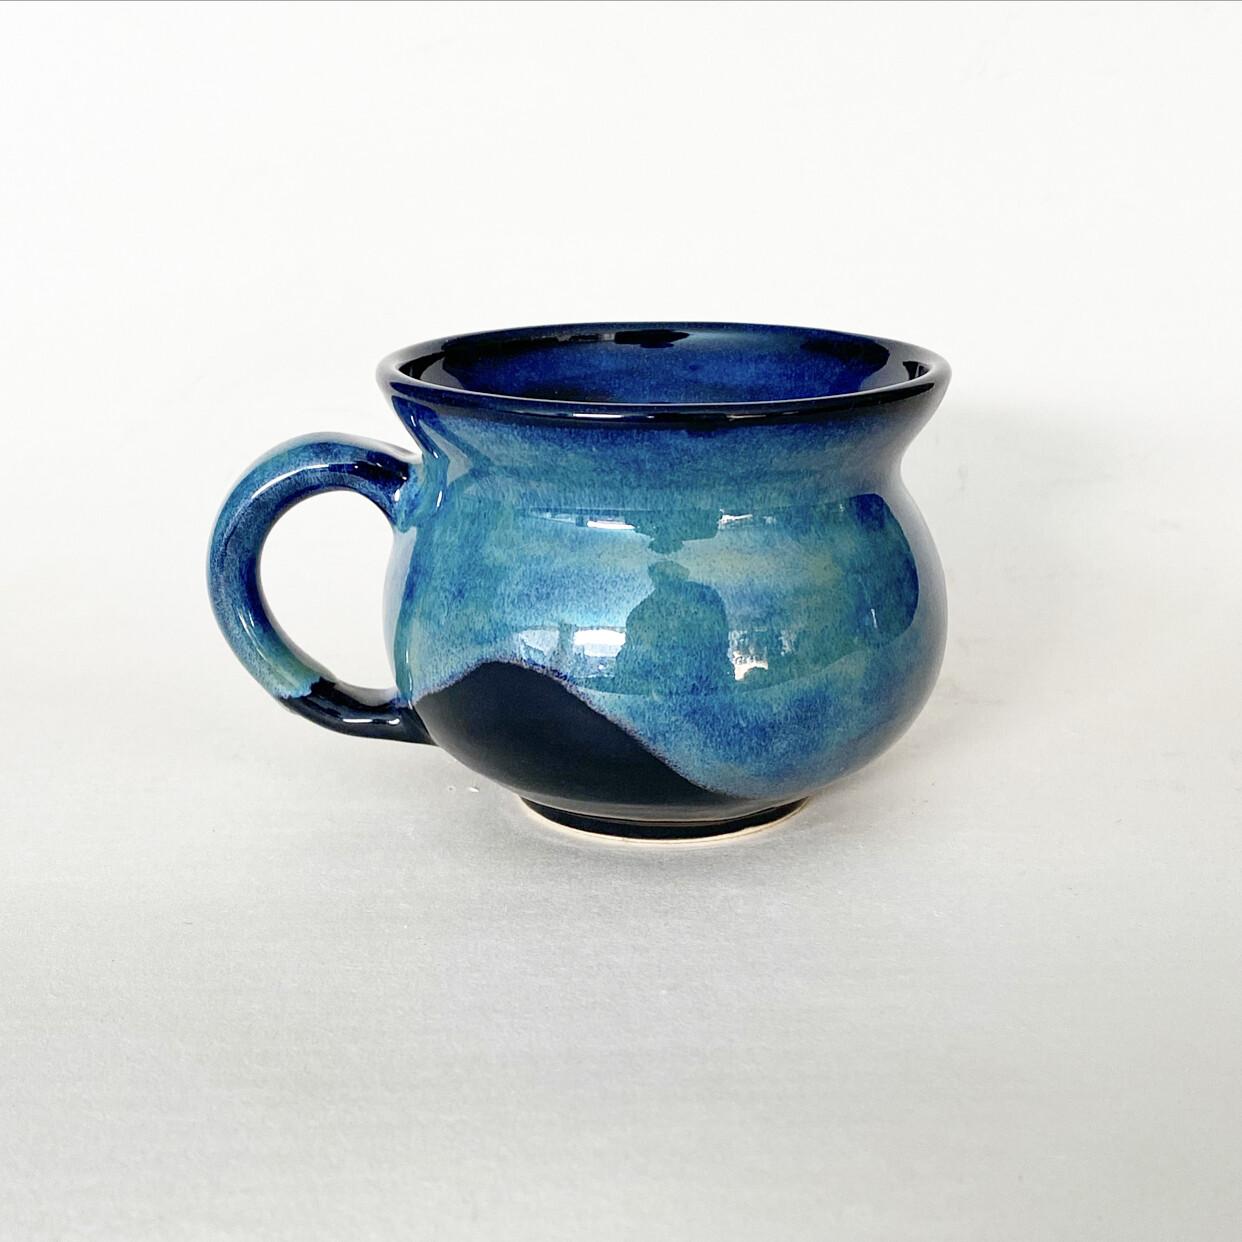 12oz Green and Blue Mug